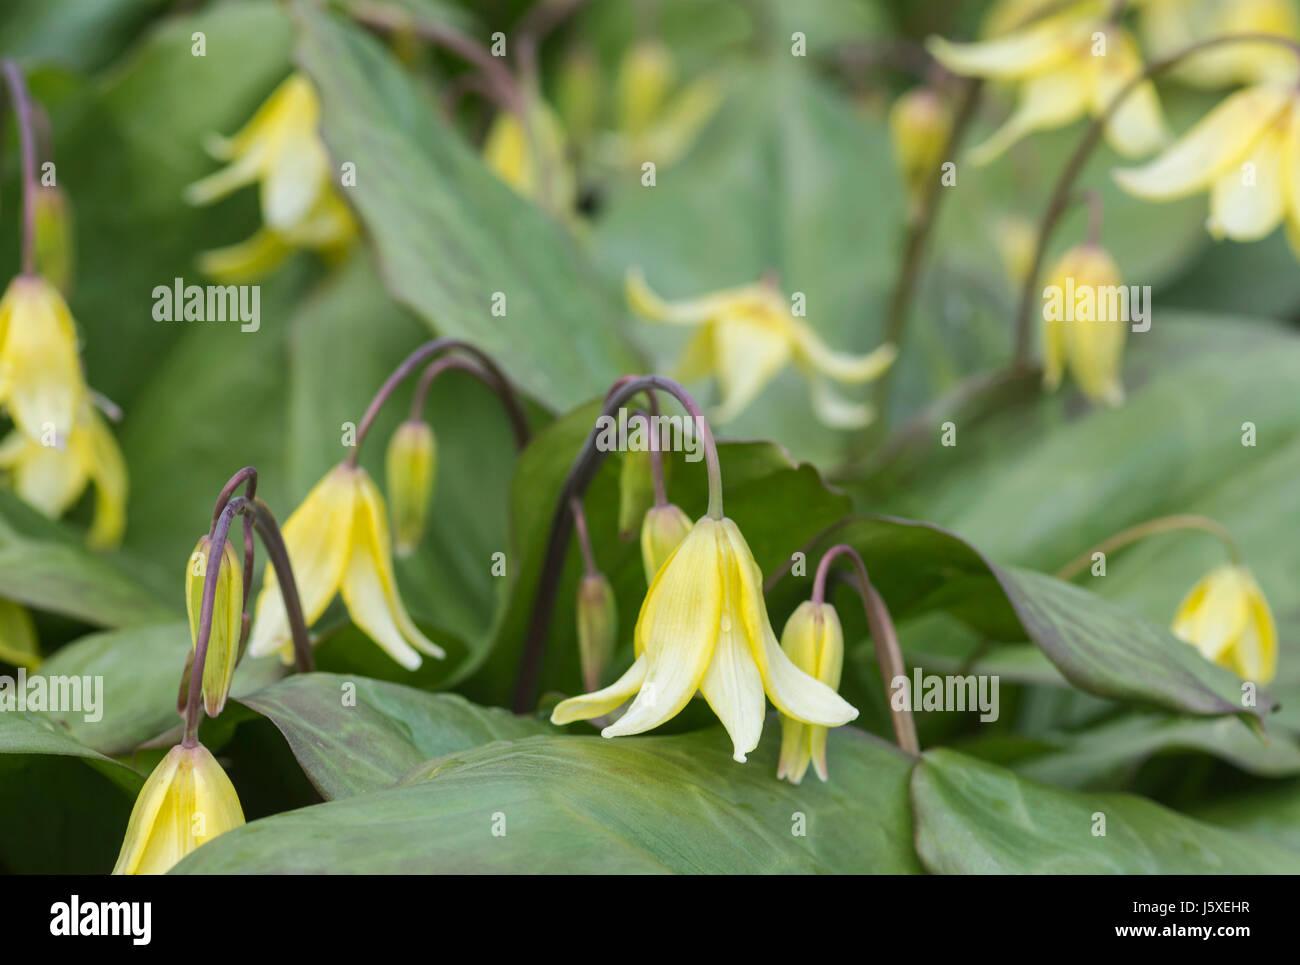 Bellwort sessile bellwort uvularia sessilifolia bell shaped bellwort sessile bellwort uvularia sessilifolia bell shaped yellow flowers growing outdoor mightylinksfo